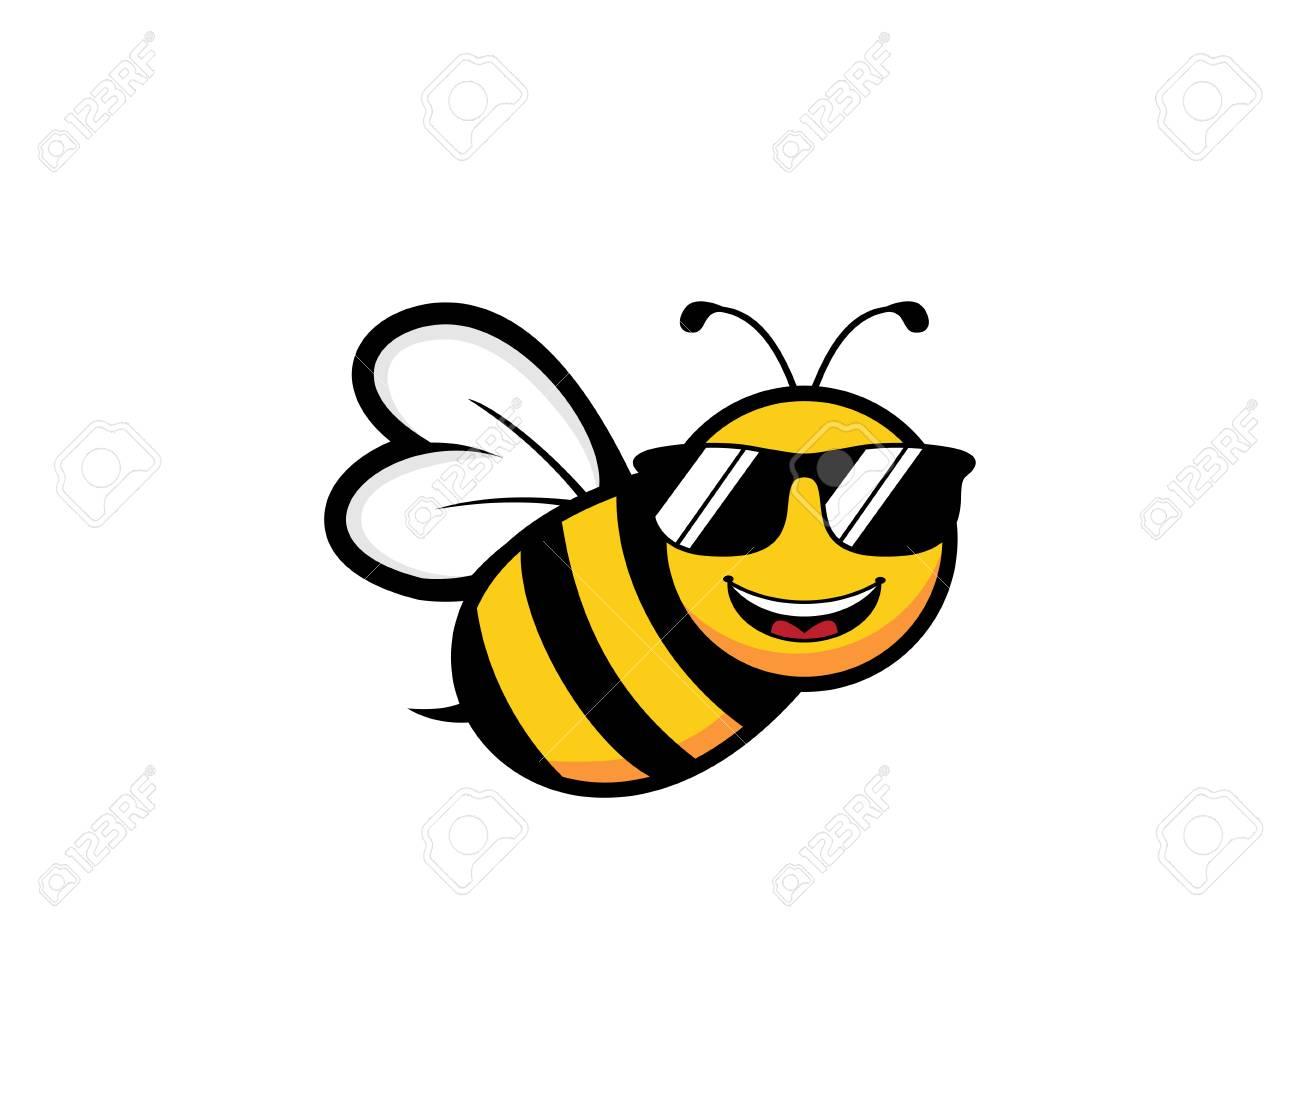 df3ccf534c95 Cute Honey Bee Mascot Character Vector Logo Design Template ...